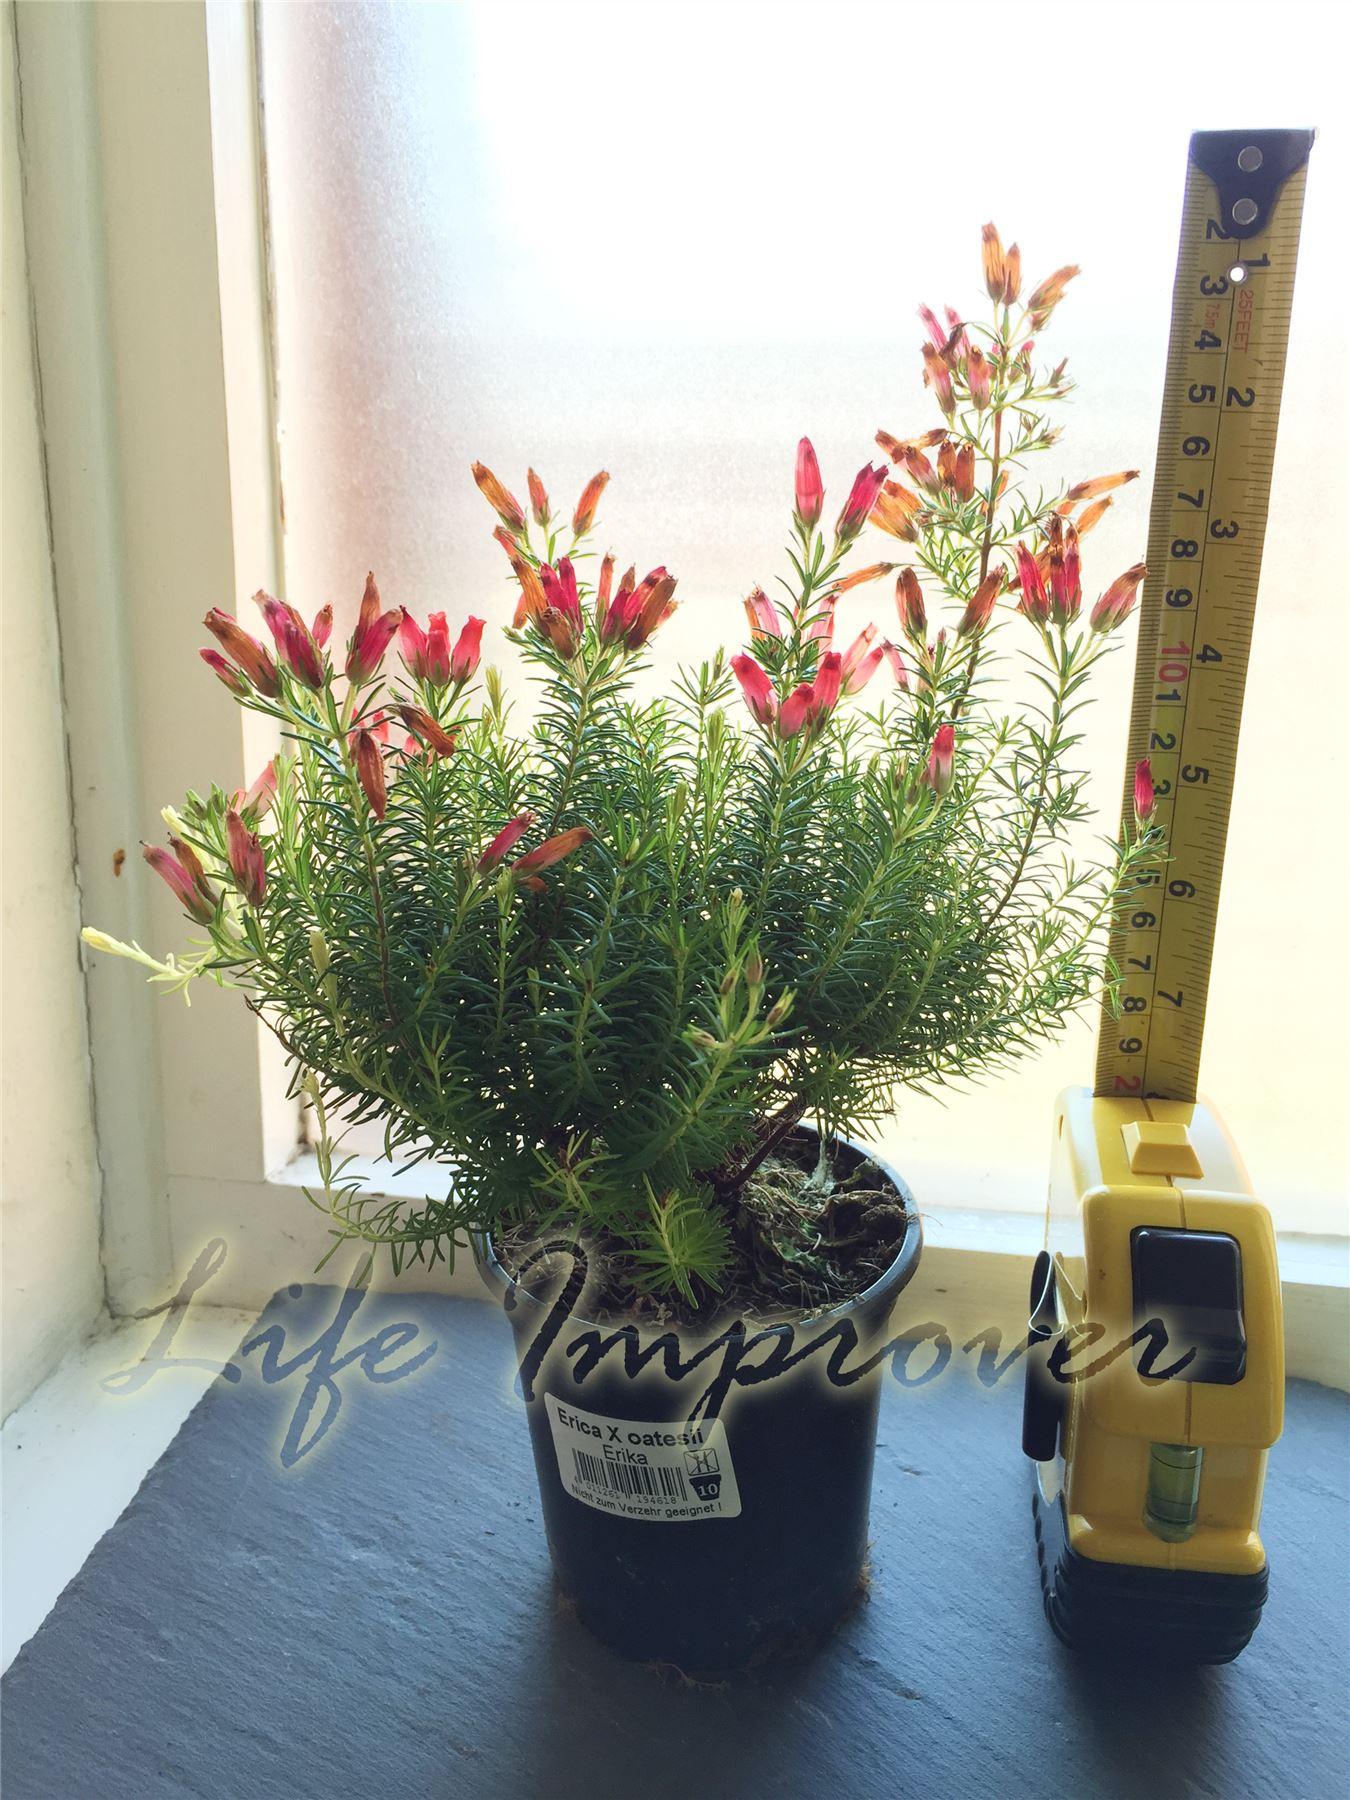 Heath erica oatesii hiver feu hardy evergreen arbuste for Plantes exterieur hiver